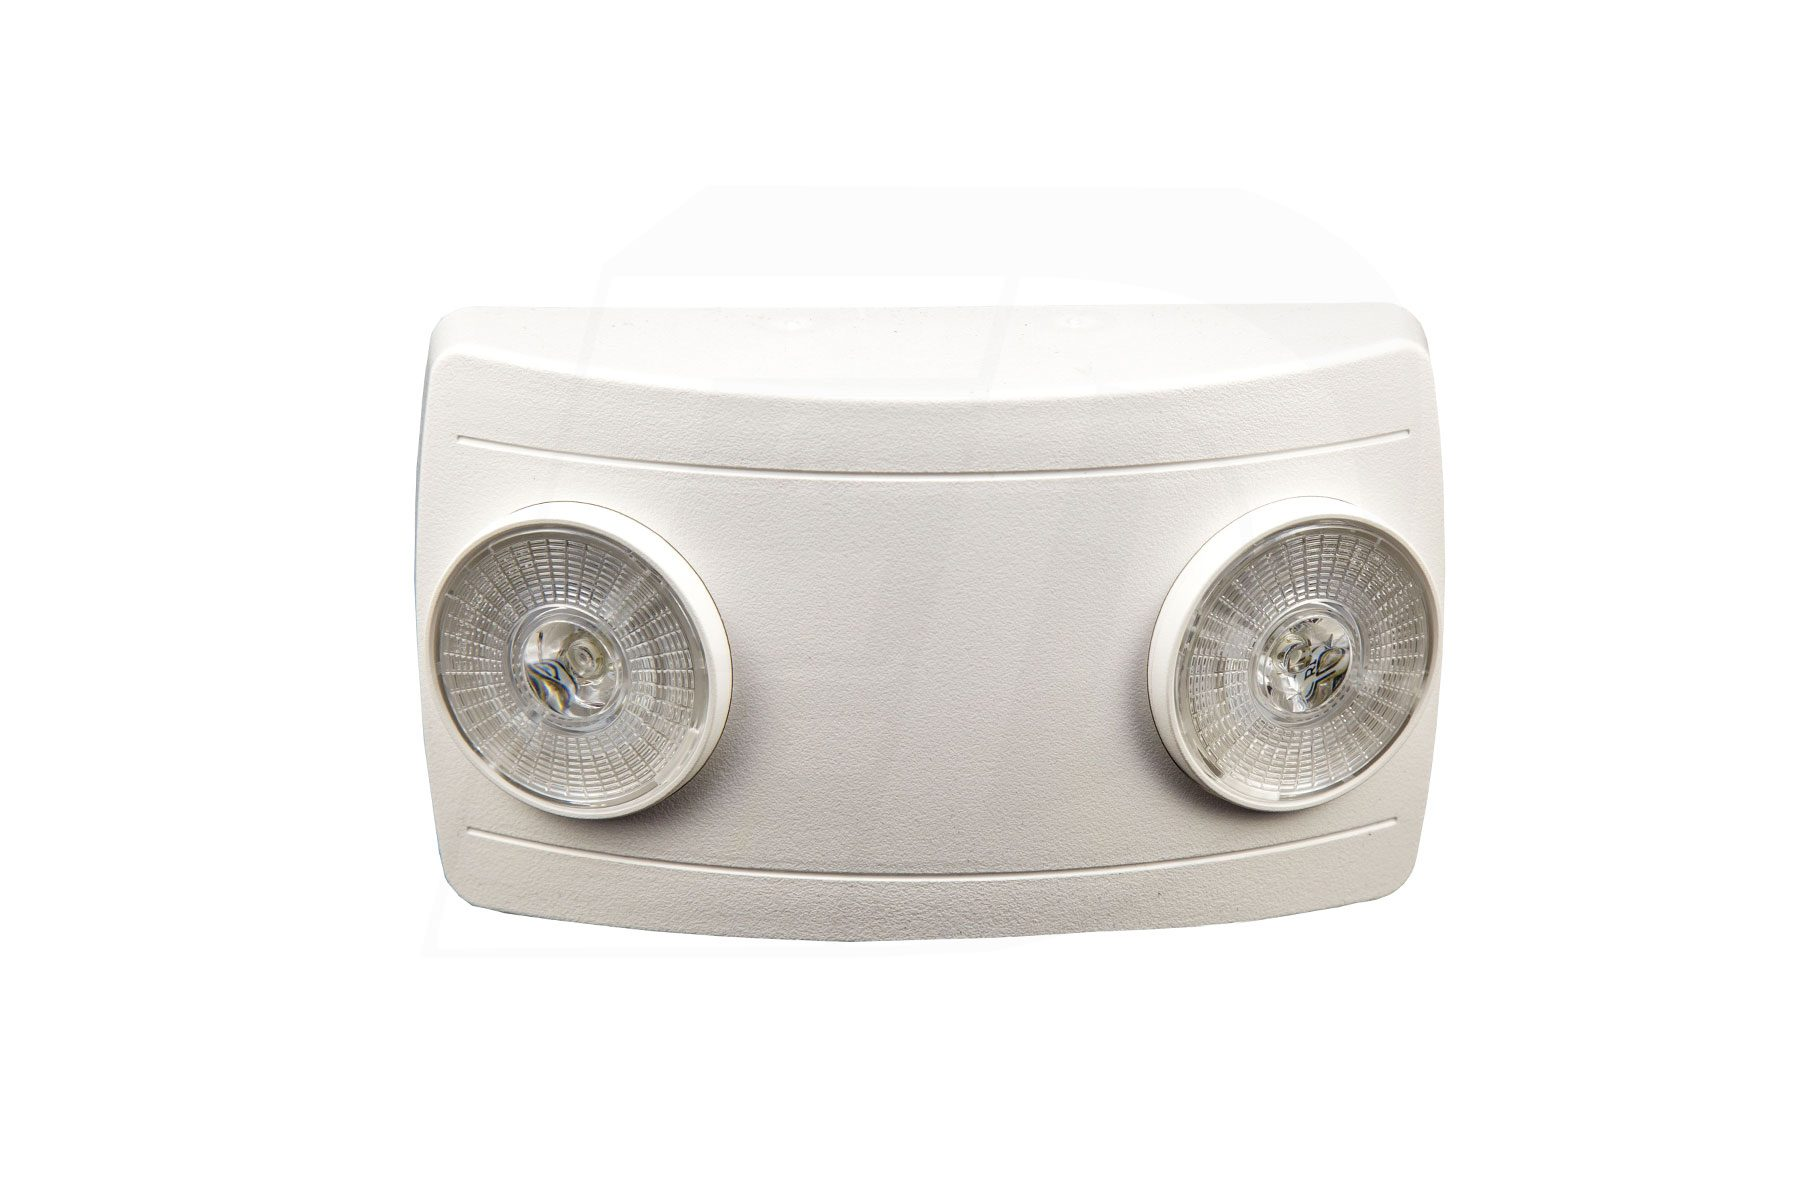 ER200WH-BUR4 - LED DUAL HEAD EMERGENCY LIGHT